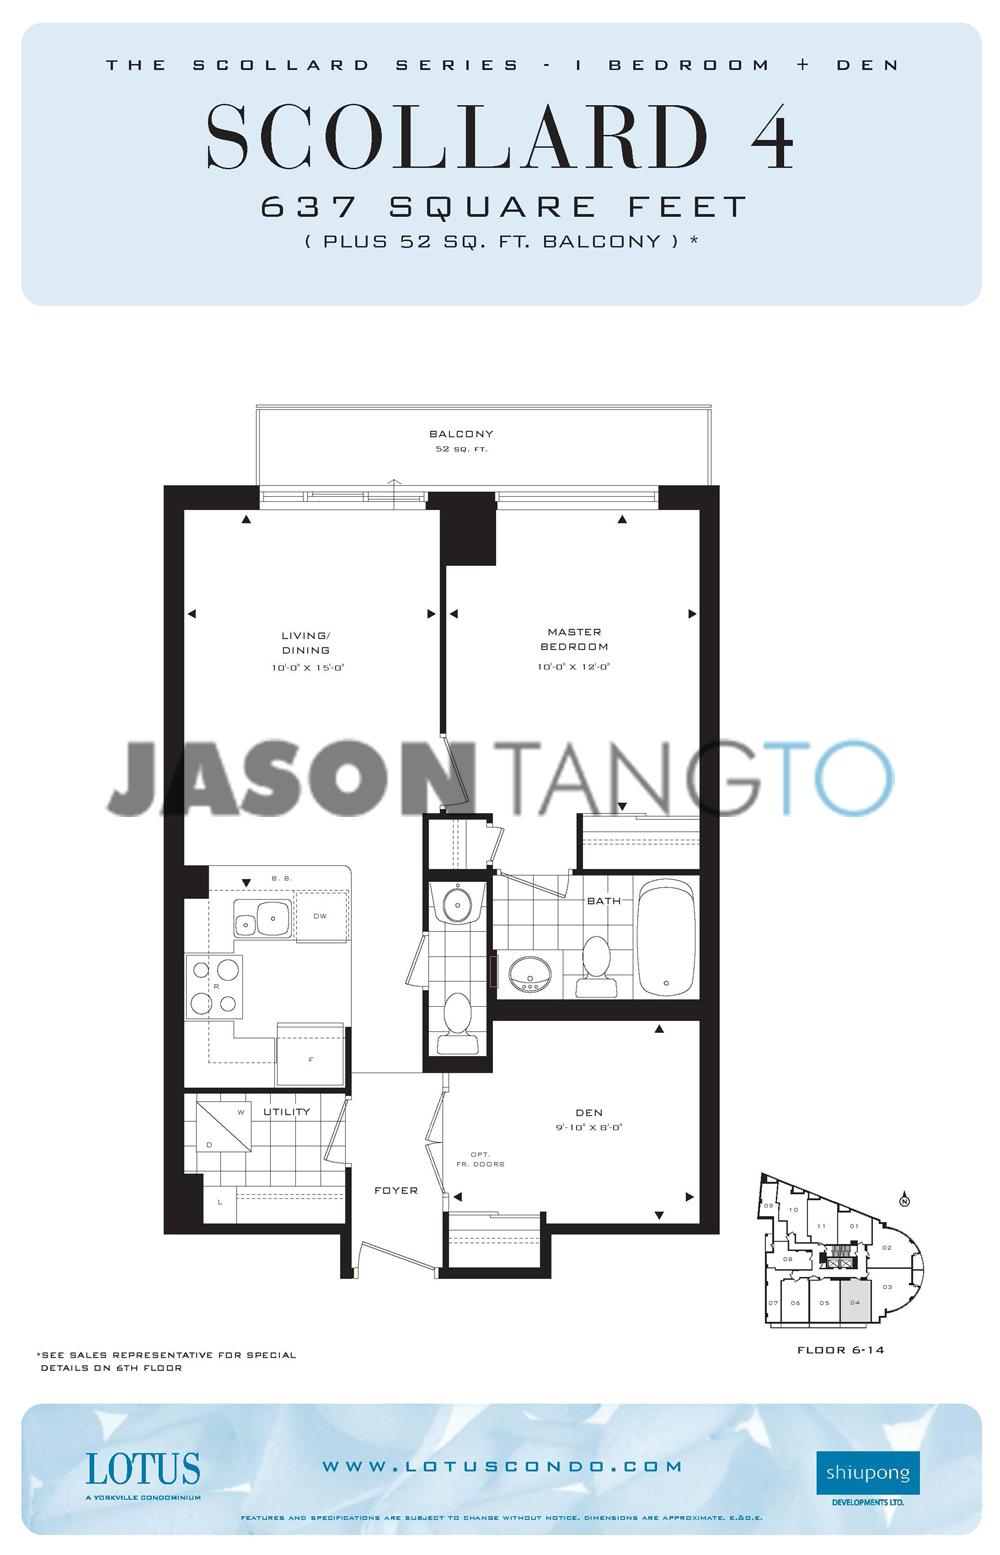 Lotus 8 scollard st toronto condos lofts for 133 hazelton floor plans